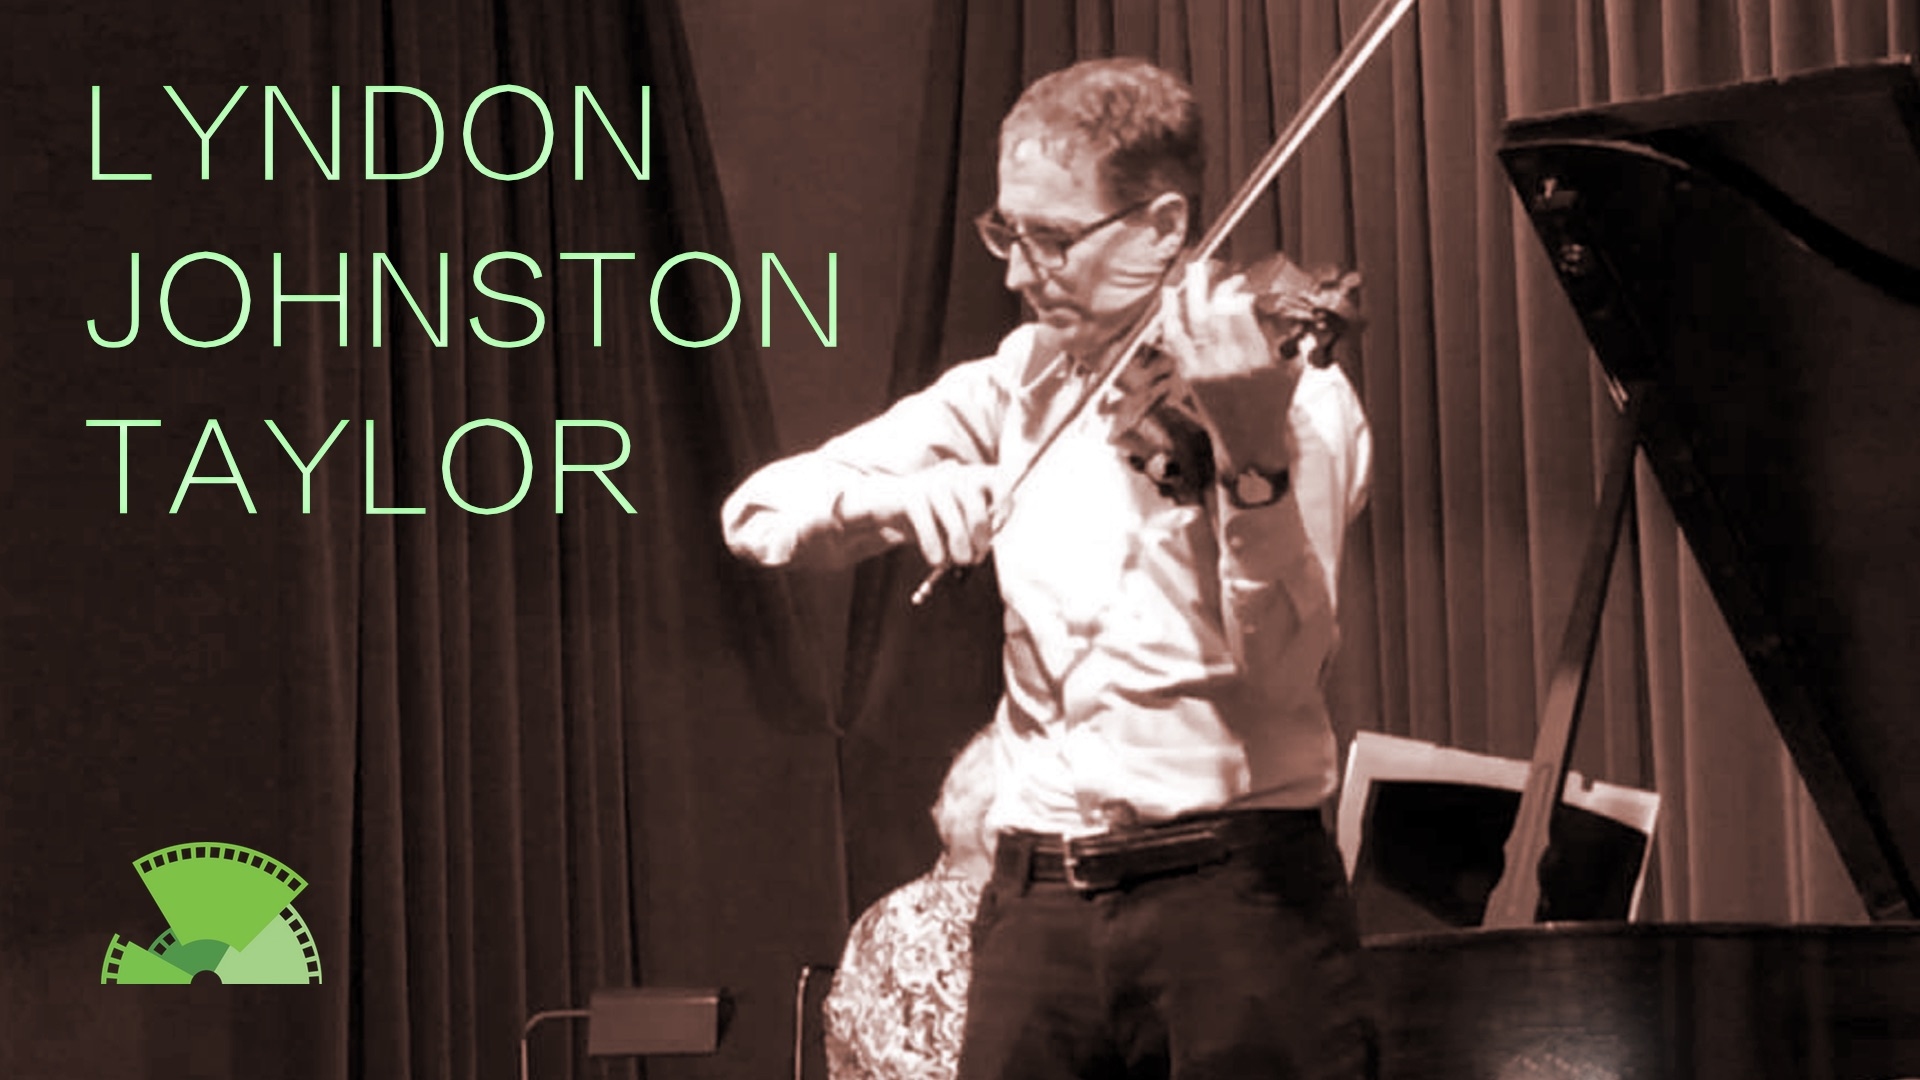 Lyndon Johnston Taylor